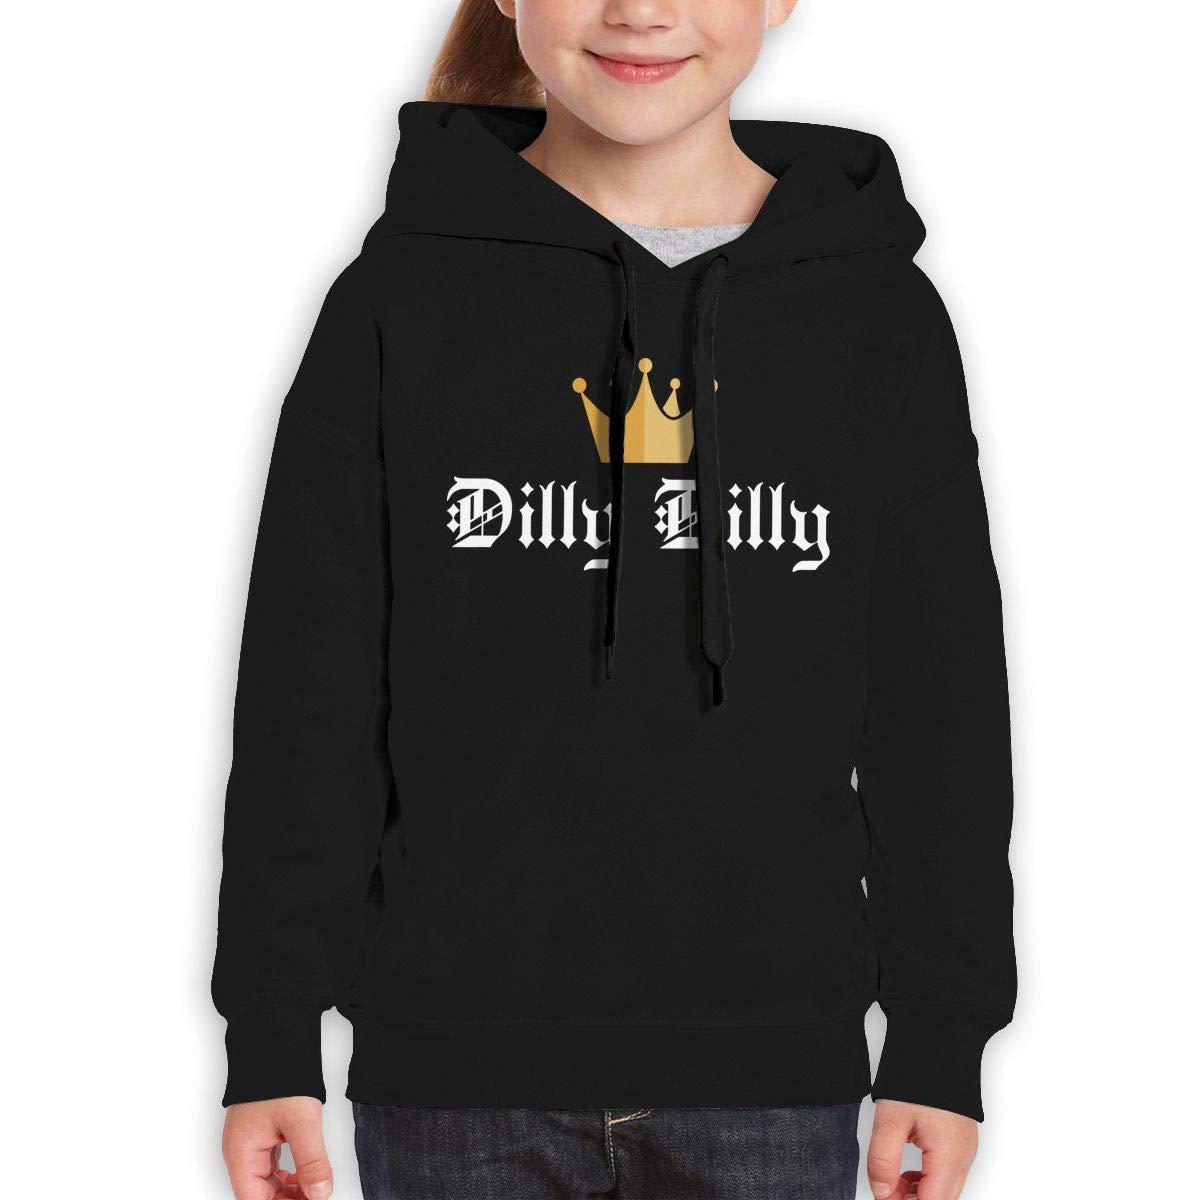 Xxxx Dtjscl Boys Girls Dilly Dilly Teen Youth Fleeces Black